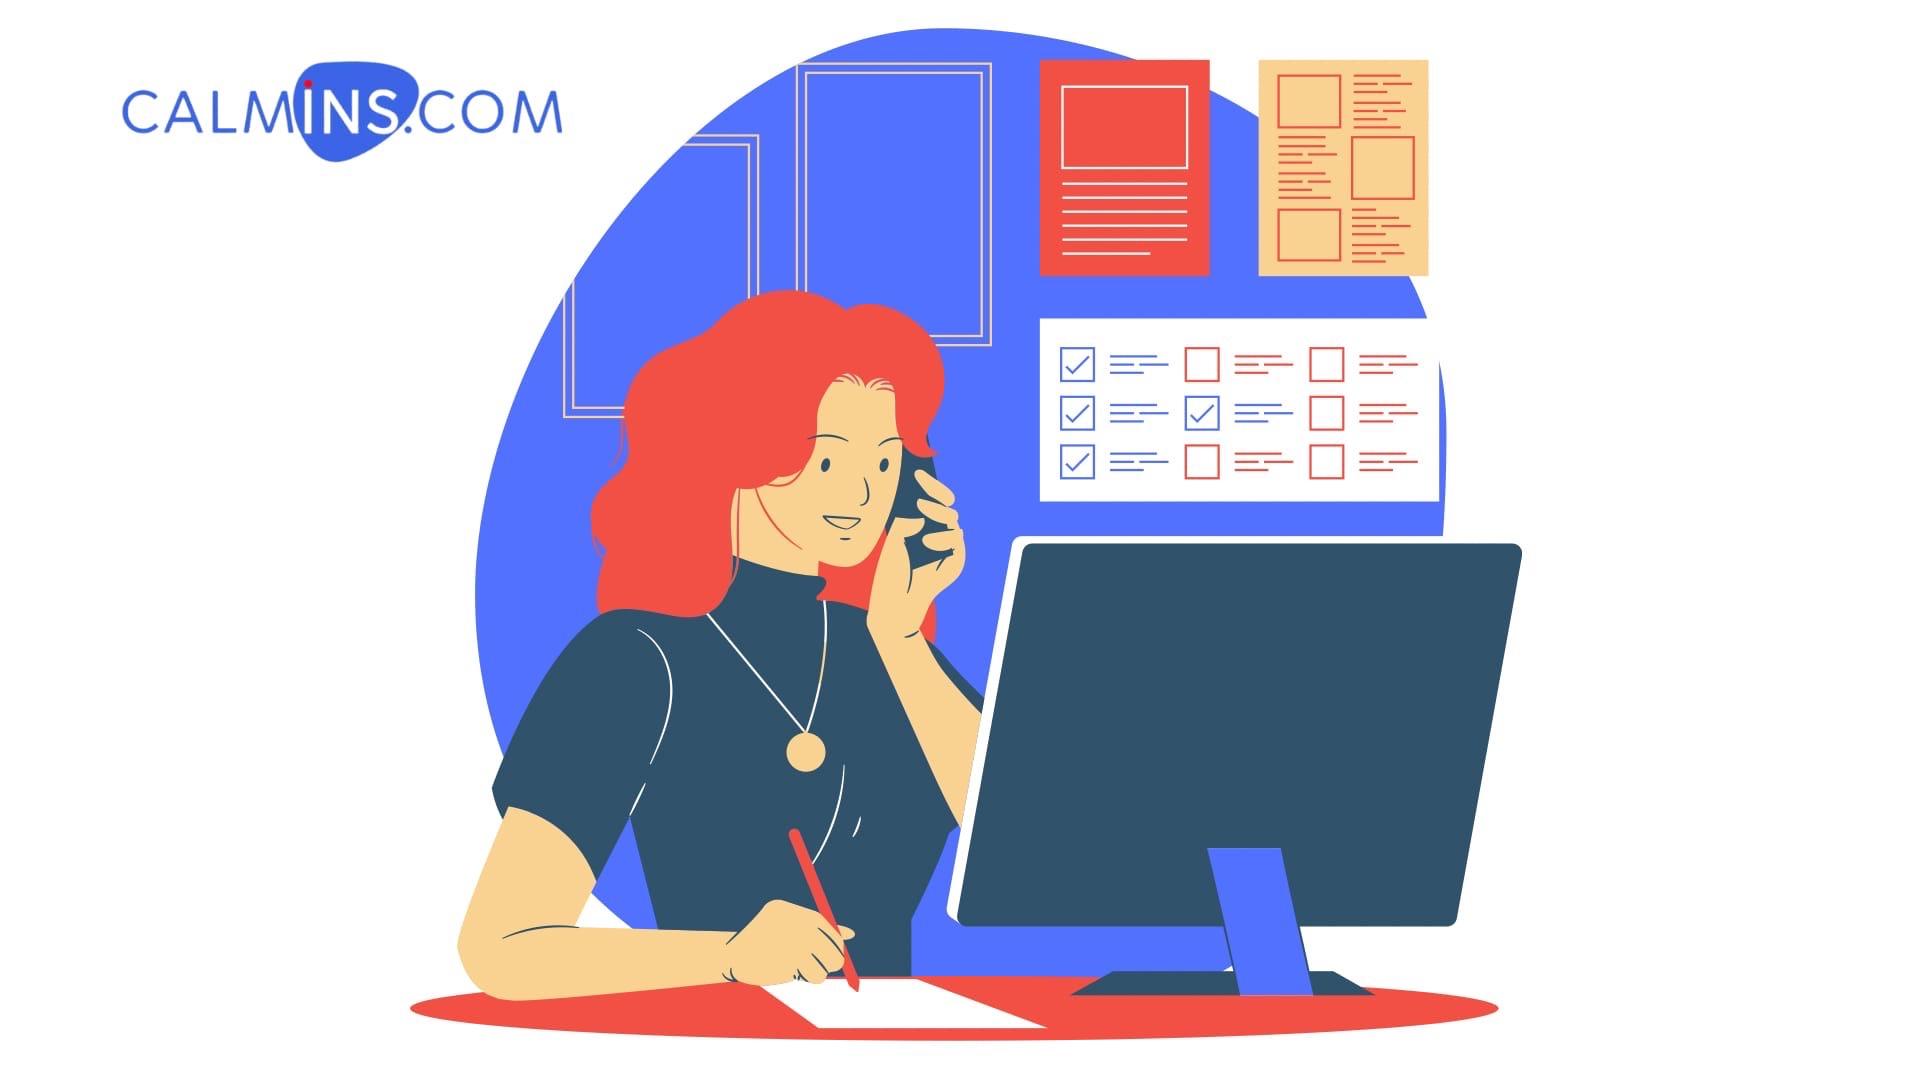 Как работать онлайн самозанятым?